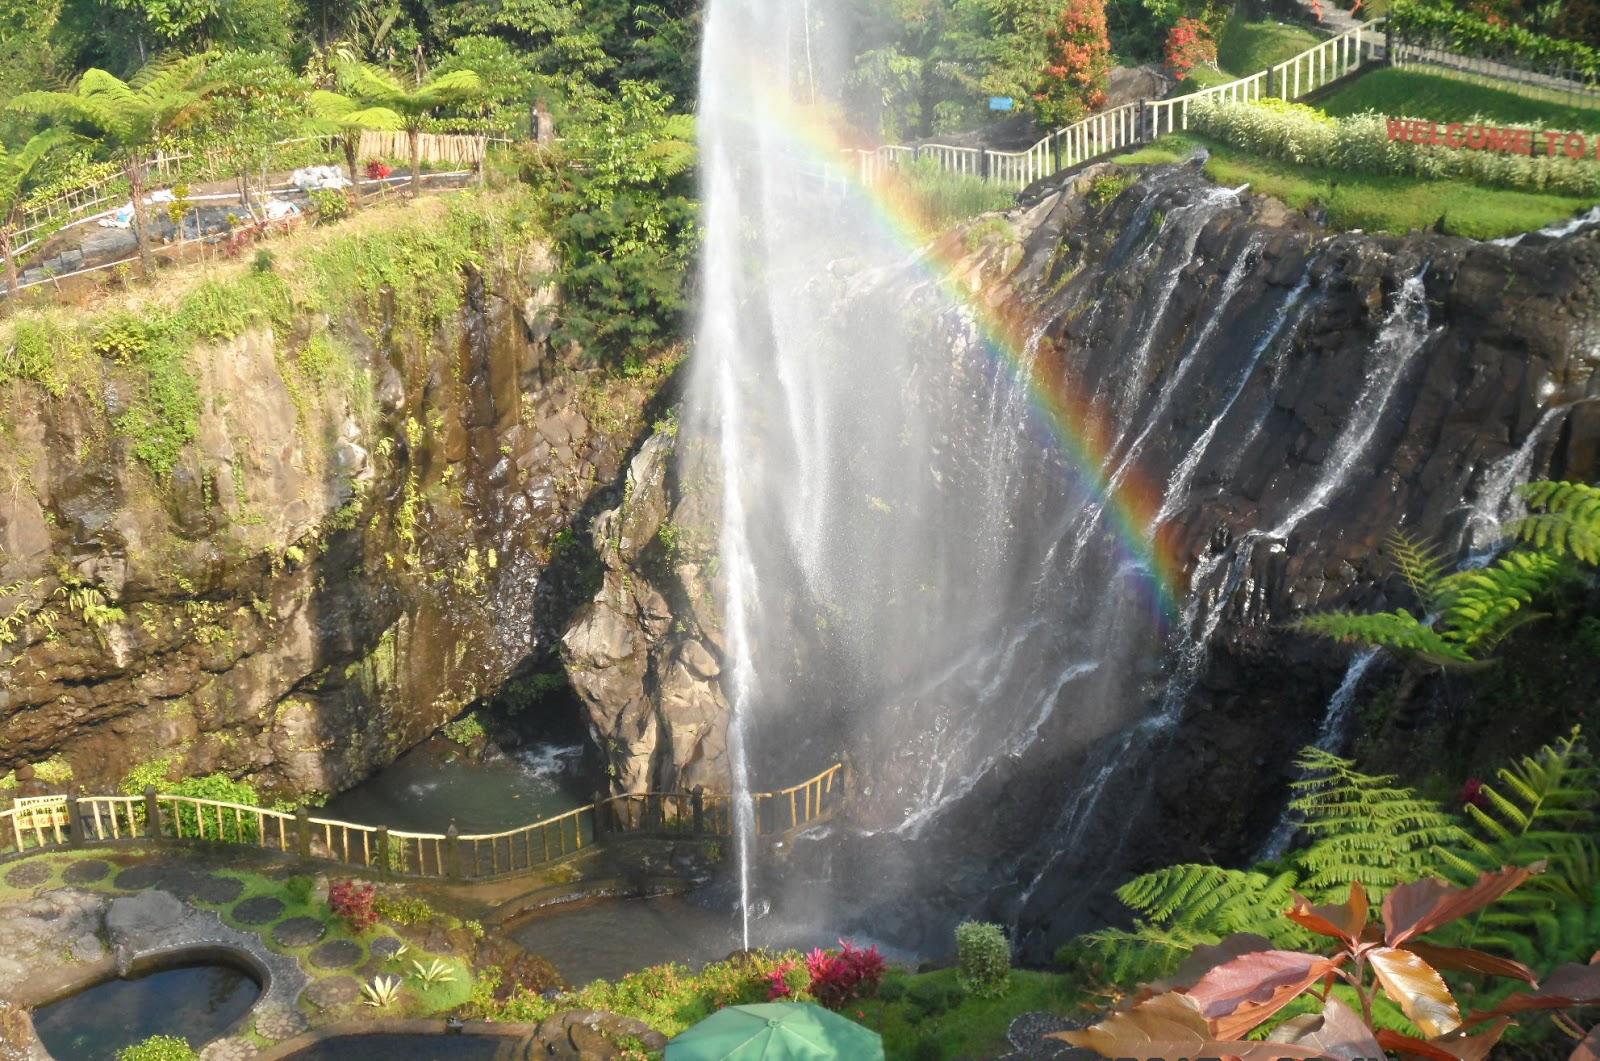 Wisata Alam Baturaden Lokawisata Lengkap Purwokerto Foto Tiket Letak Baturraden